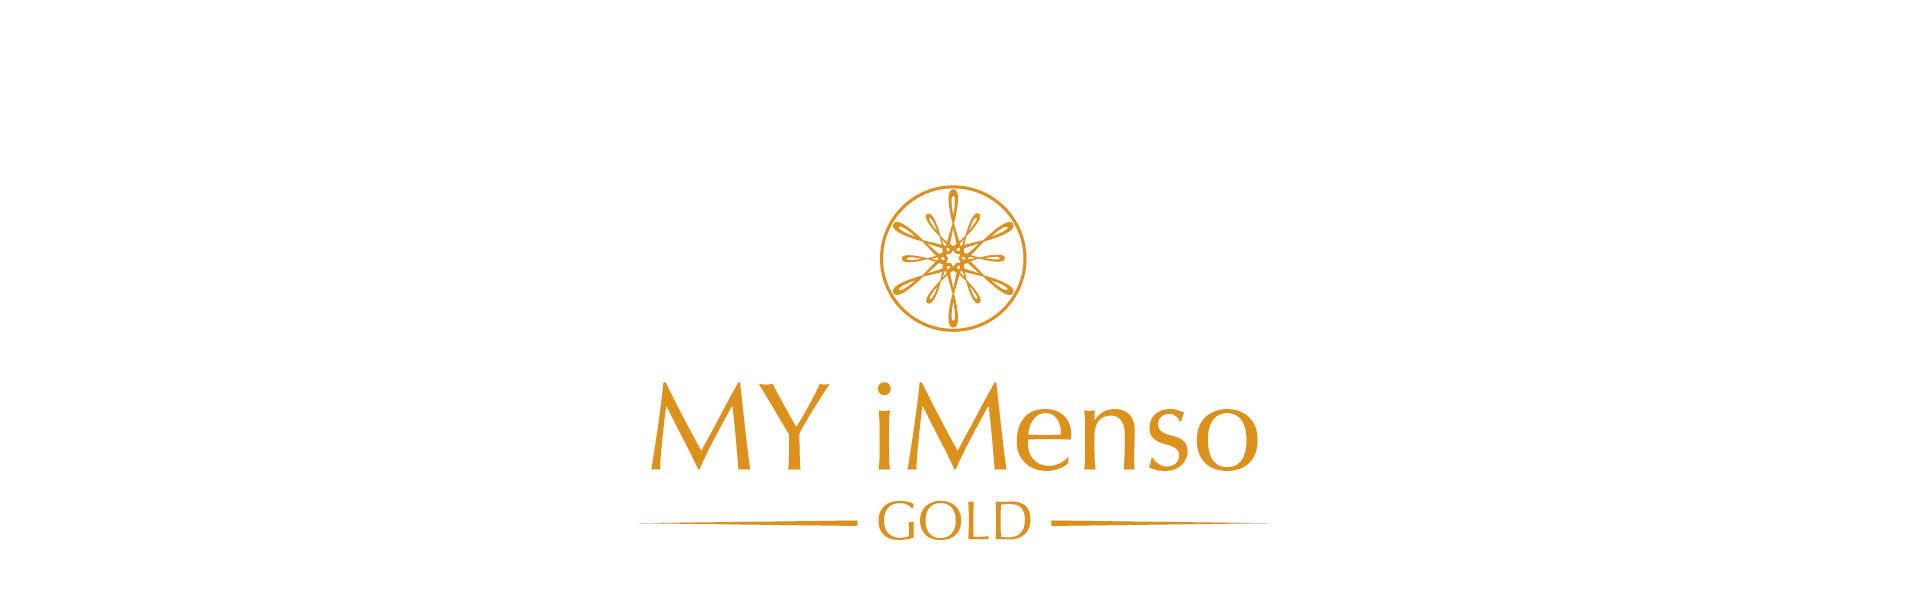 De mooiste gouden sieraden van MY iMenso Gold!